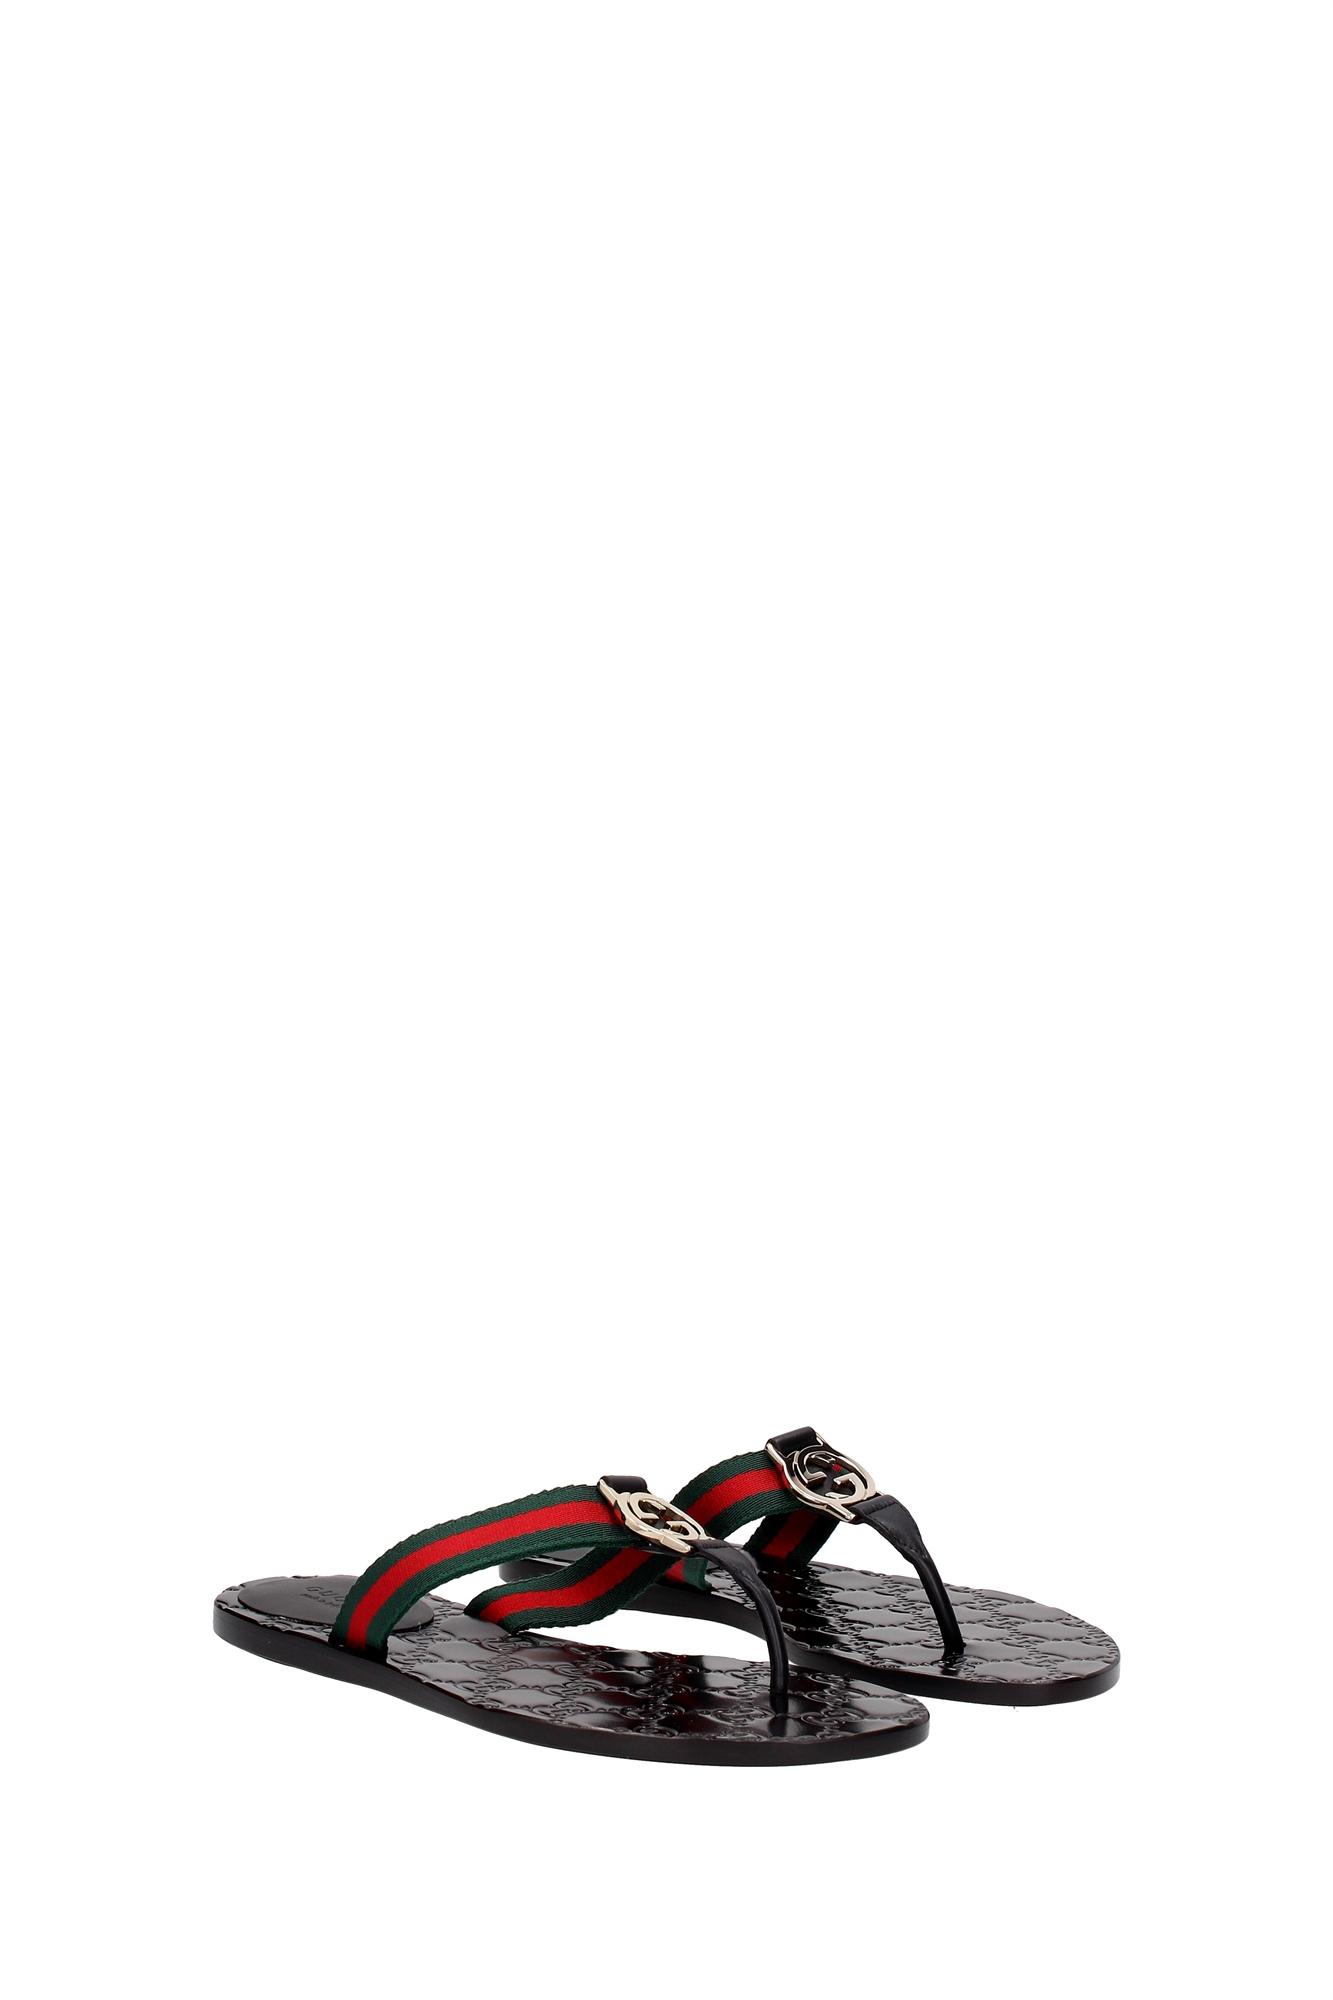 Stoff Flip Flops : flip flops gucci damen stoff schwarz 270374h90208476 ebay ~ Frokenaadalensverden.com Haus und Dekorationen